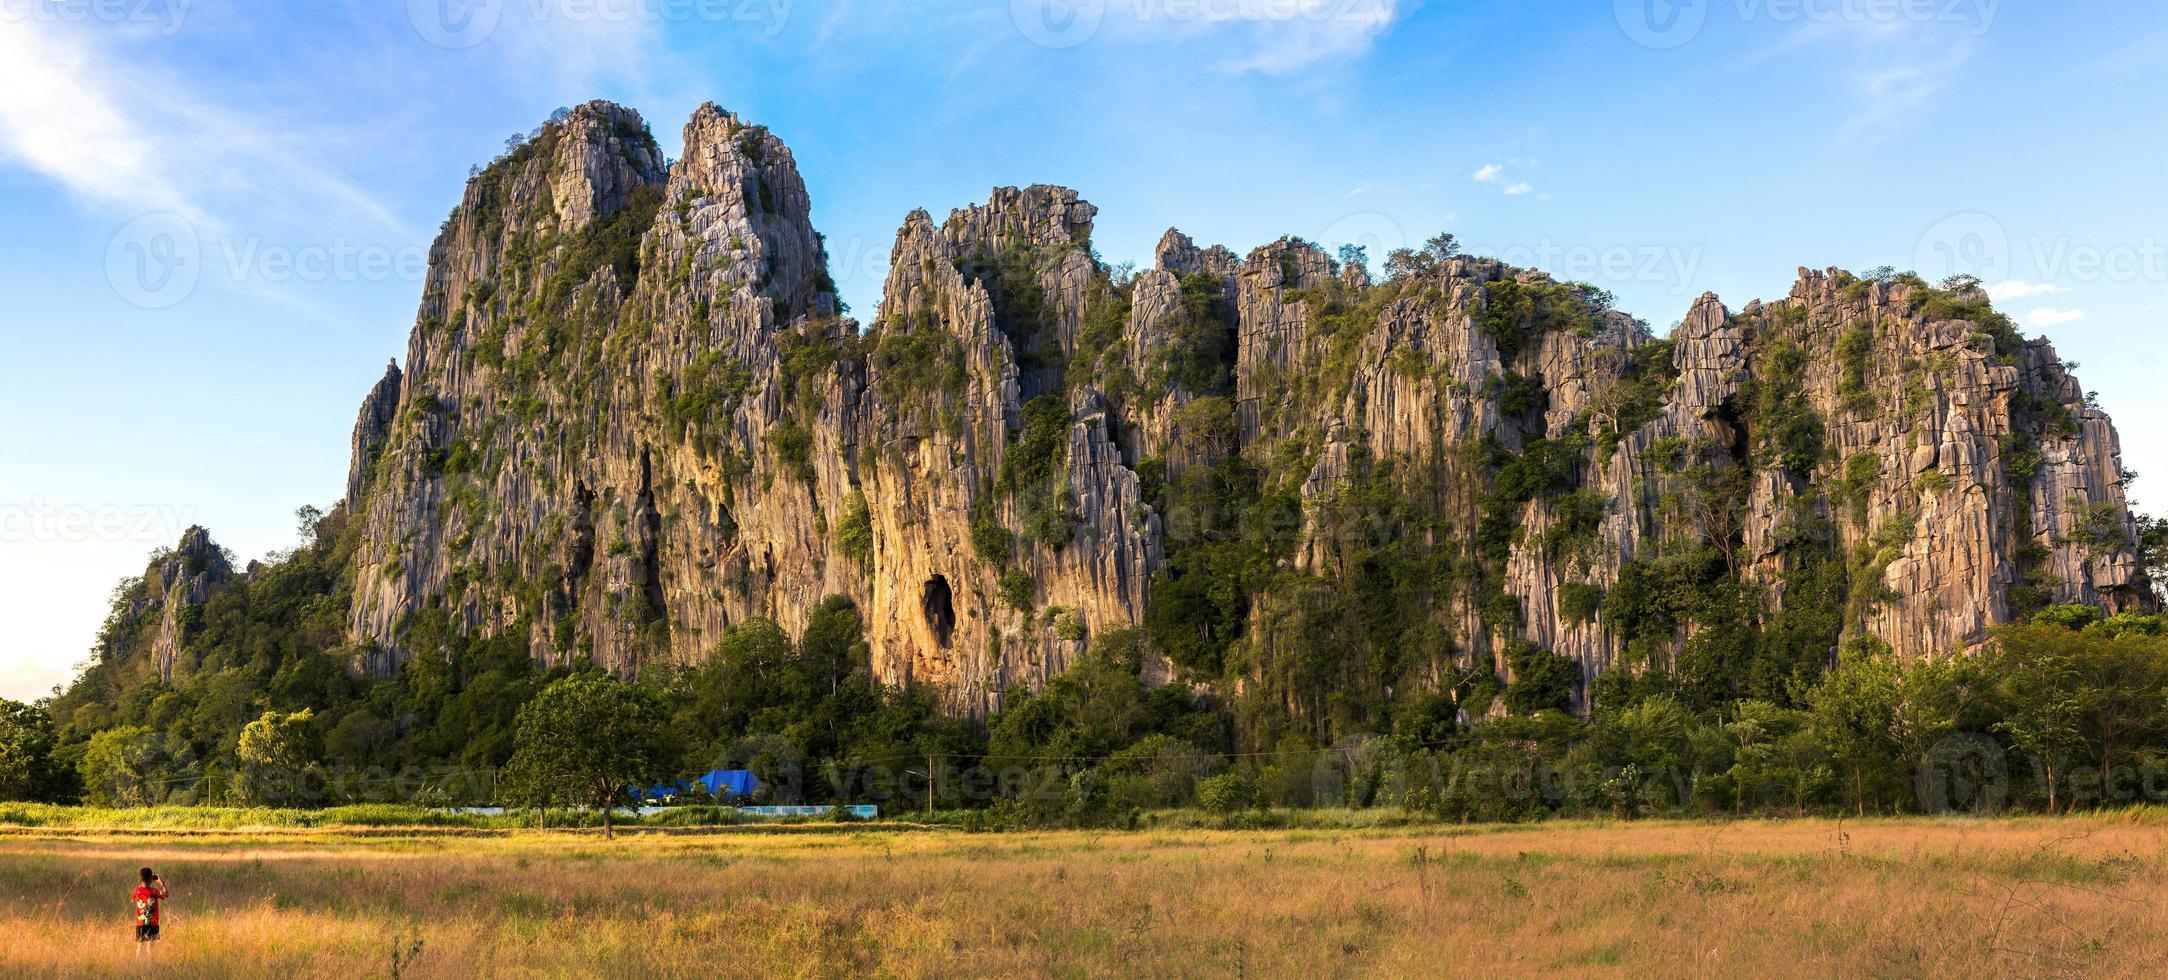 montanha patawee, uthai thani thialand foto